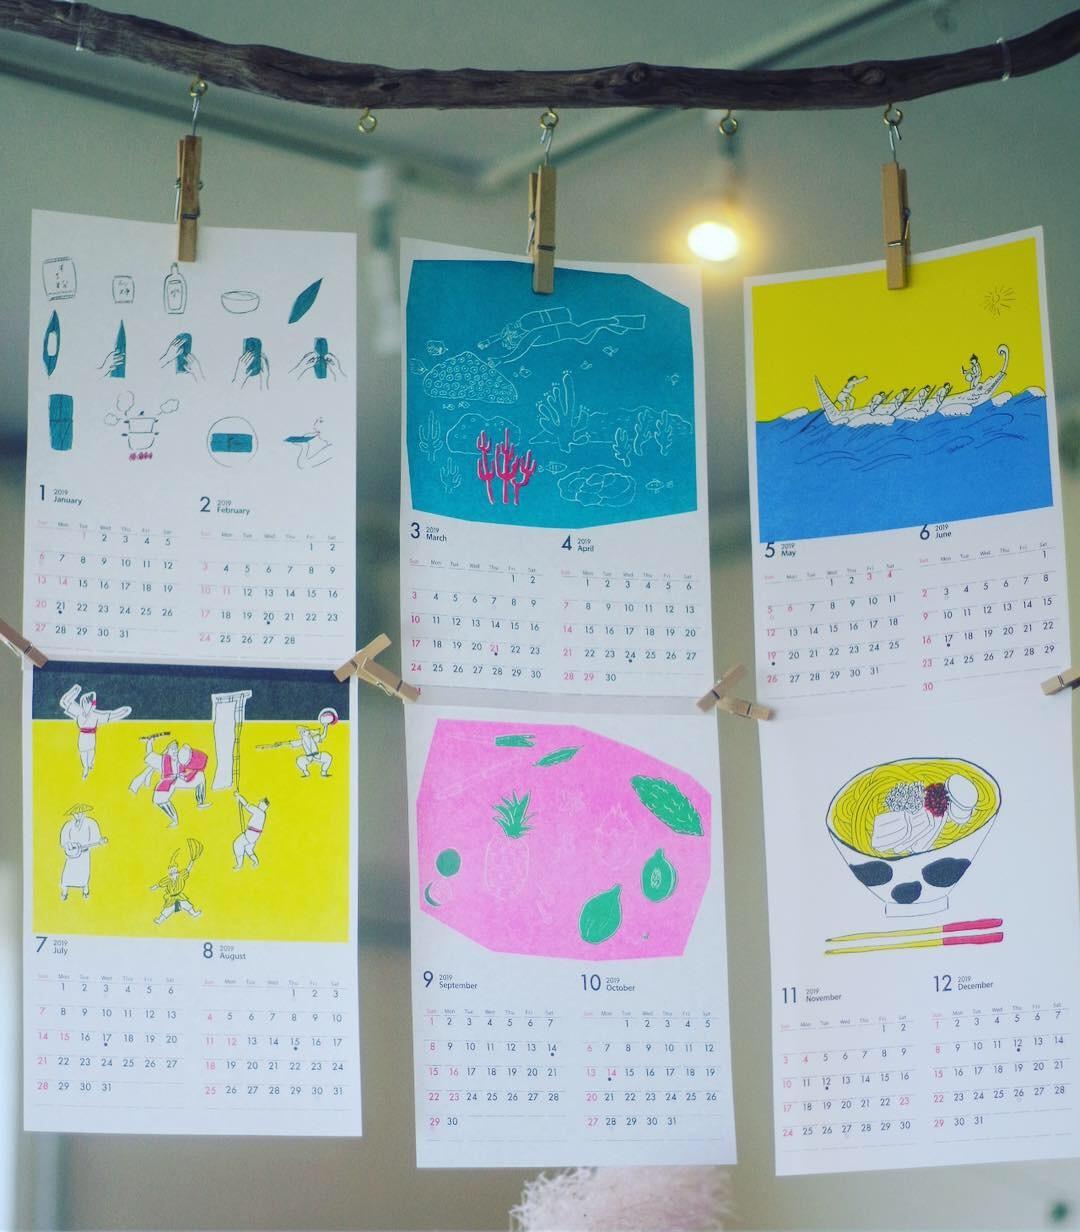 【manoオリジナル】2019沖縄カレンダー(kitoco.)